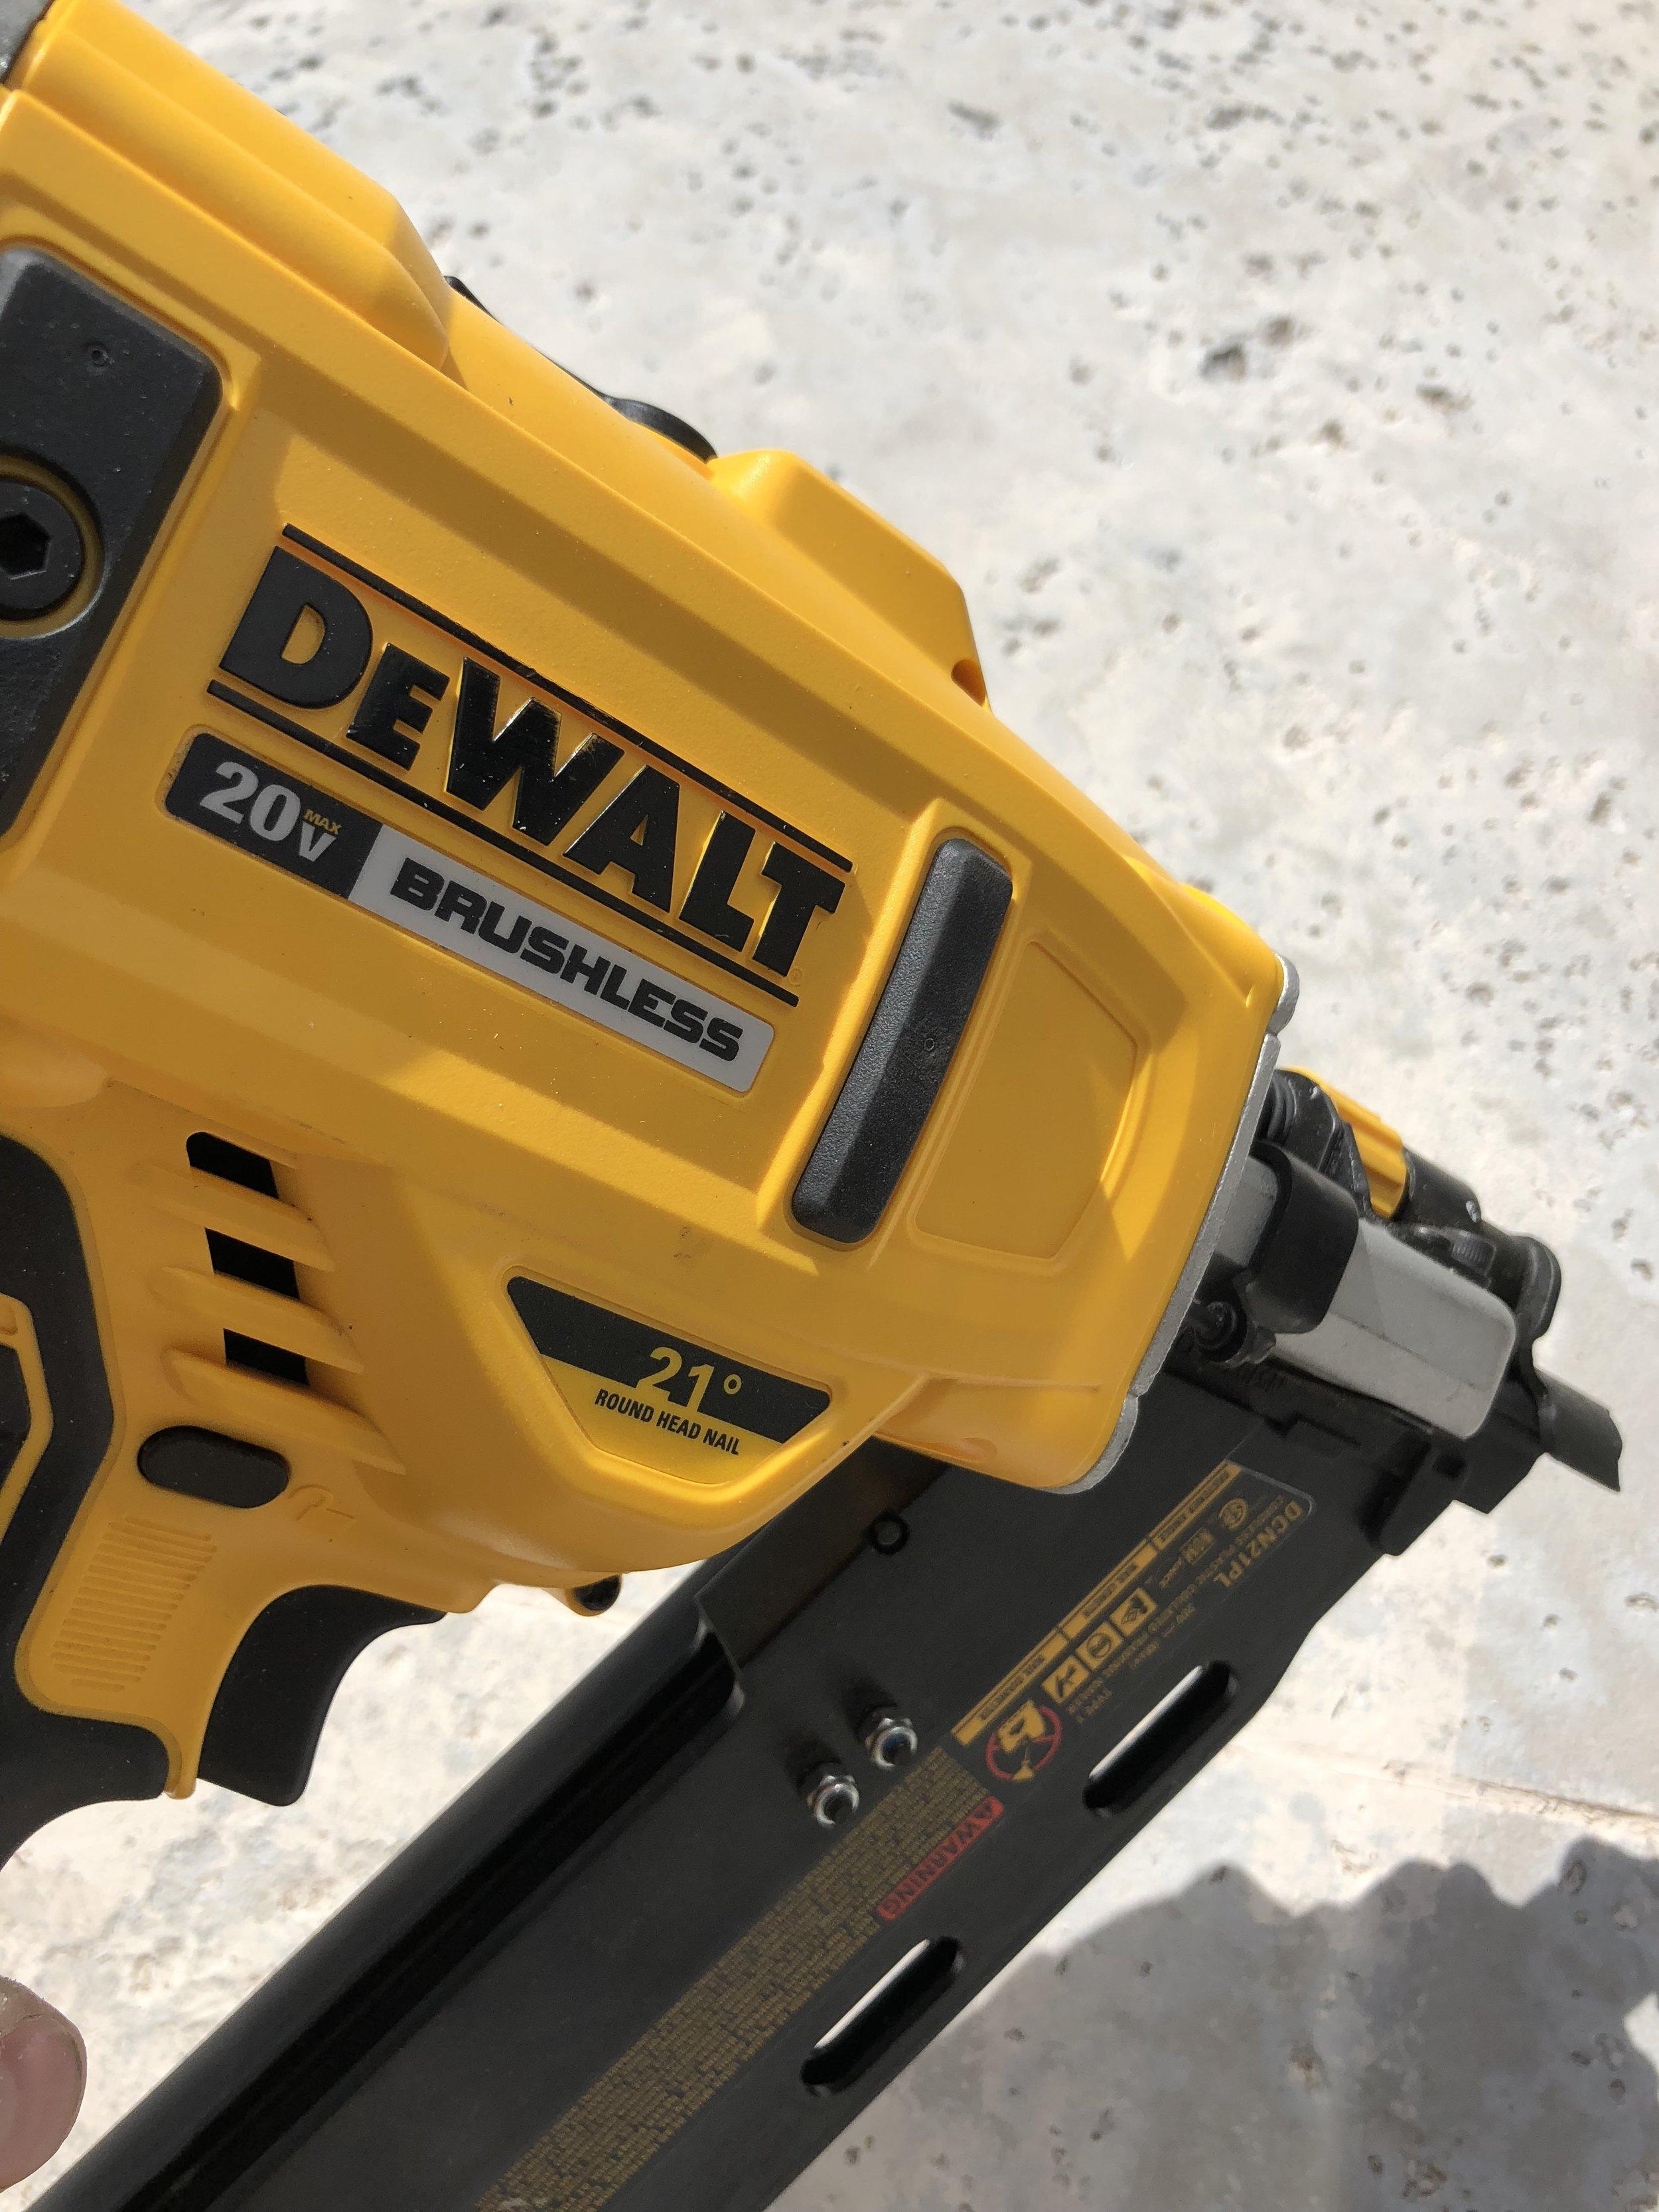 dewalt-21-degree-cordless-brushless-framing-nailer